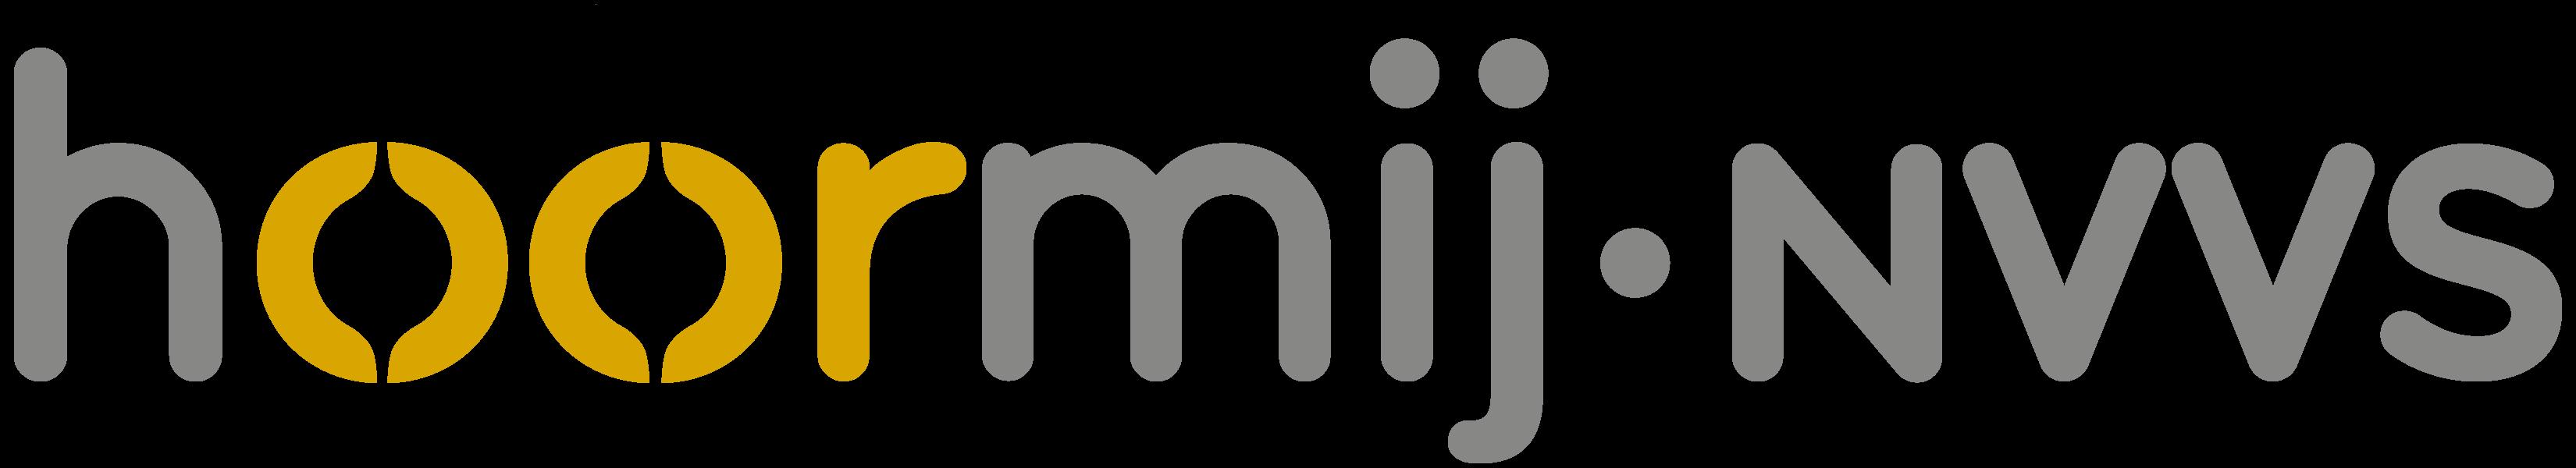 Hoormij NVVS logo